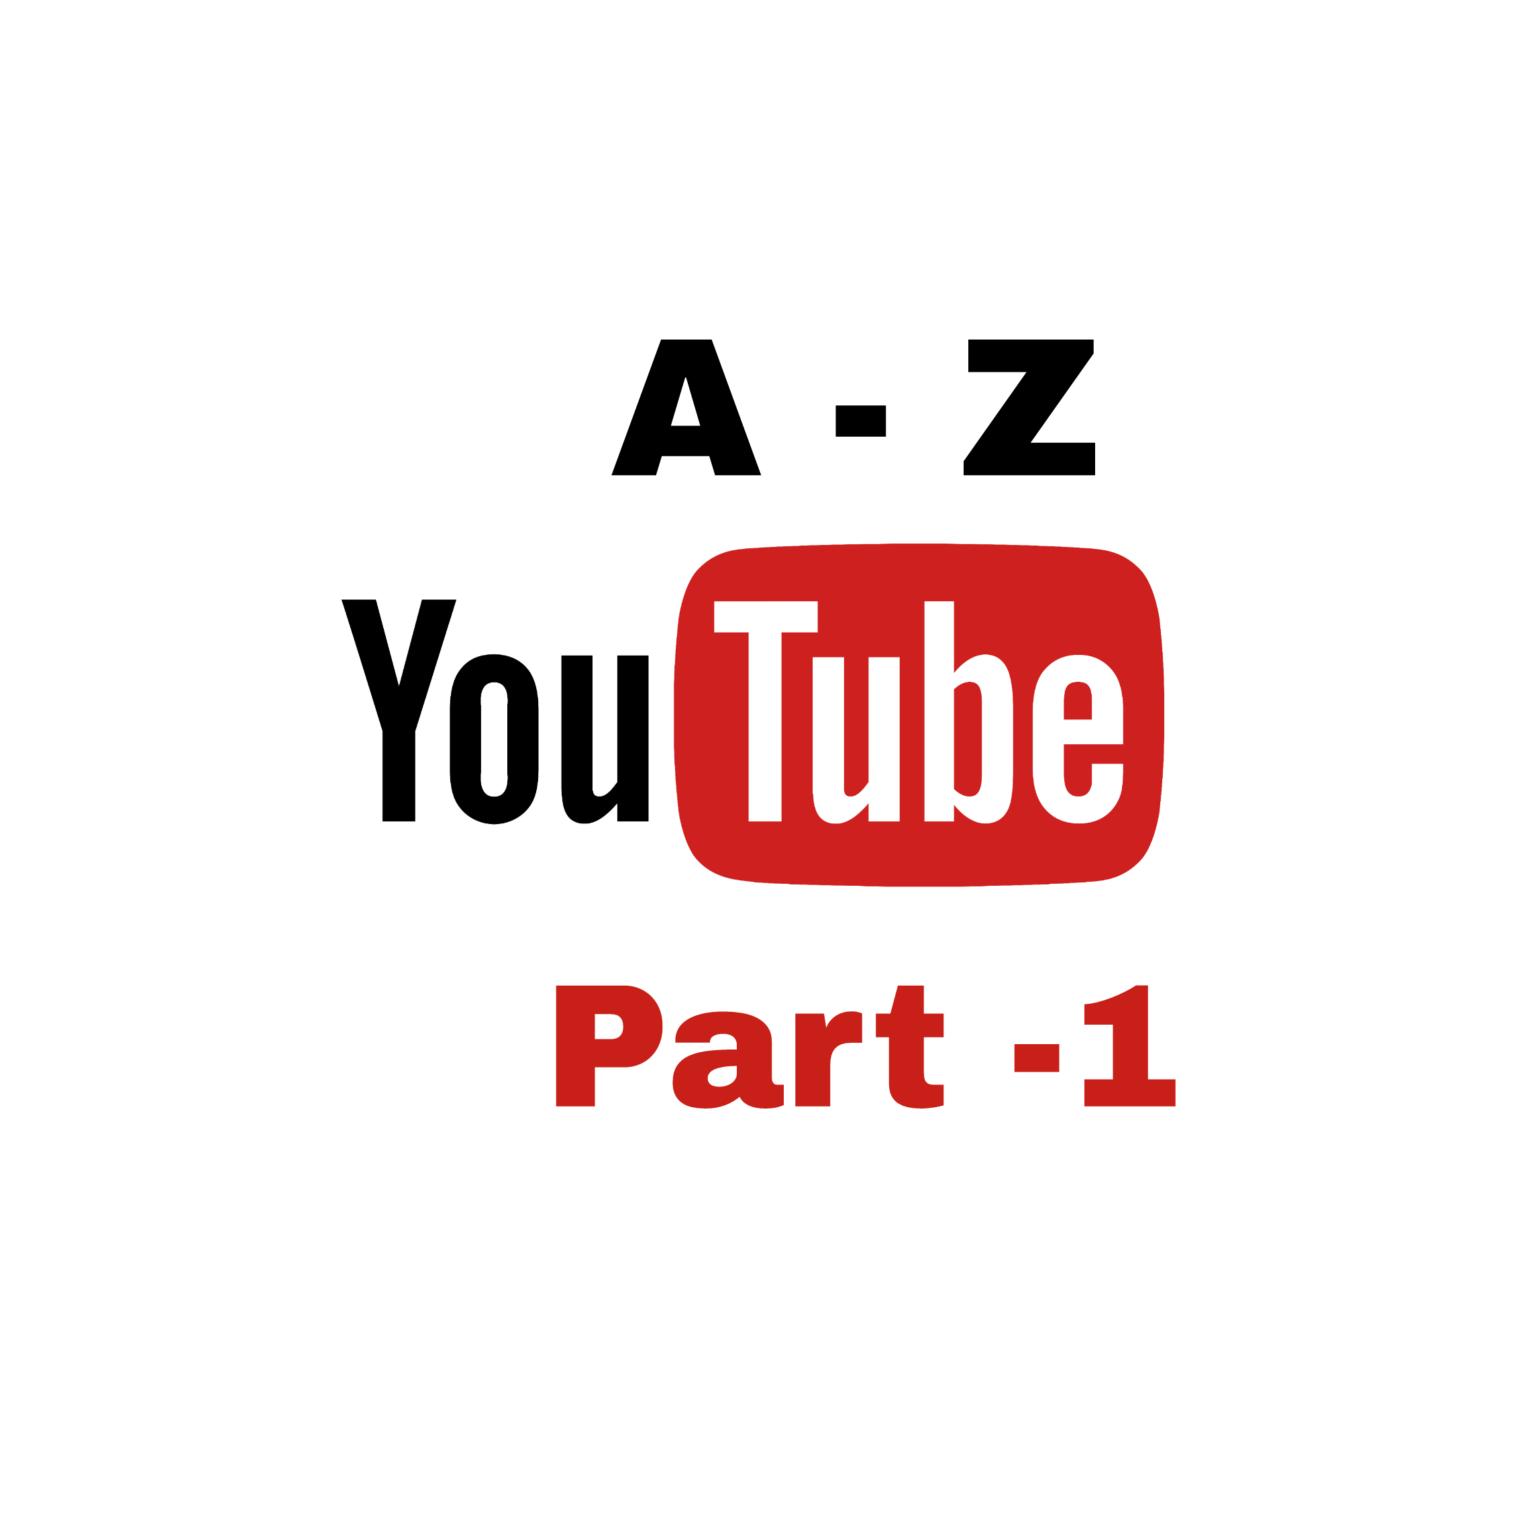 [Request] Youtube এ কাজ করে টাকা আয় করুন A-Z!!!! Part – 1 [আলোচনা]